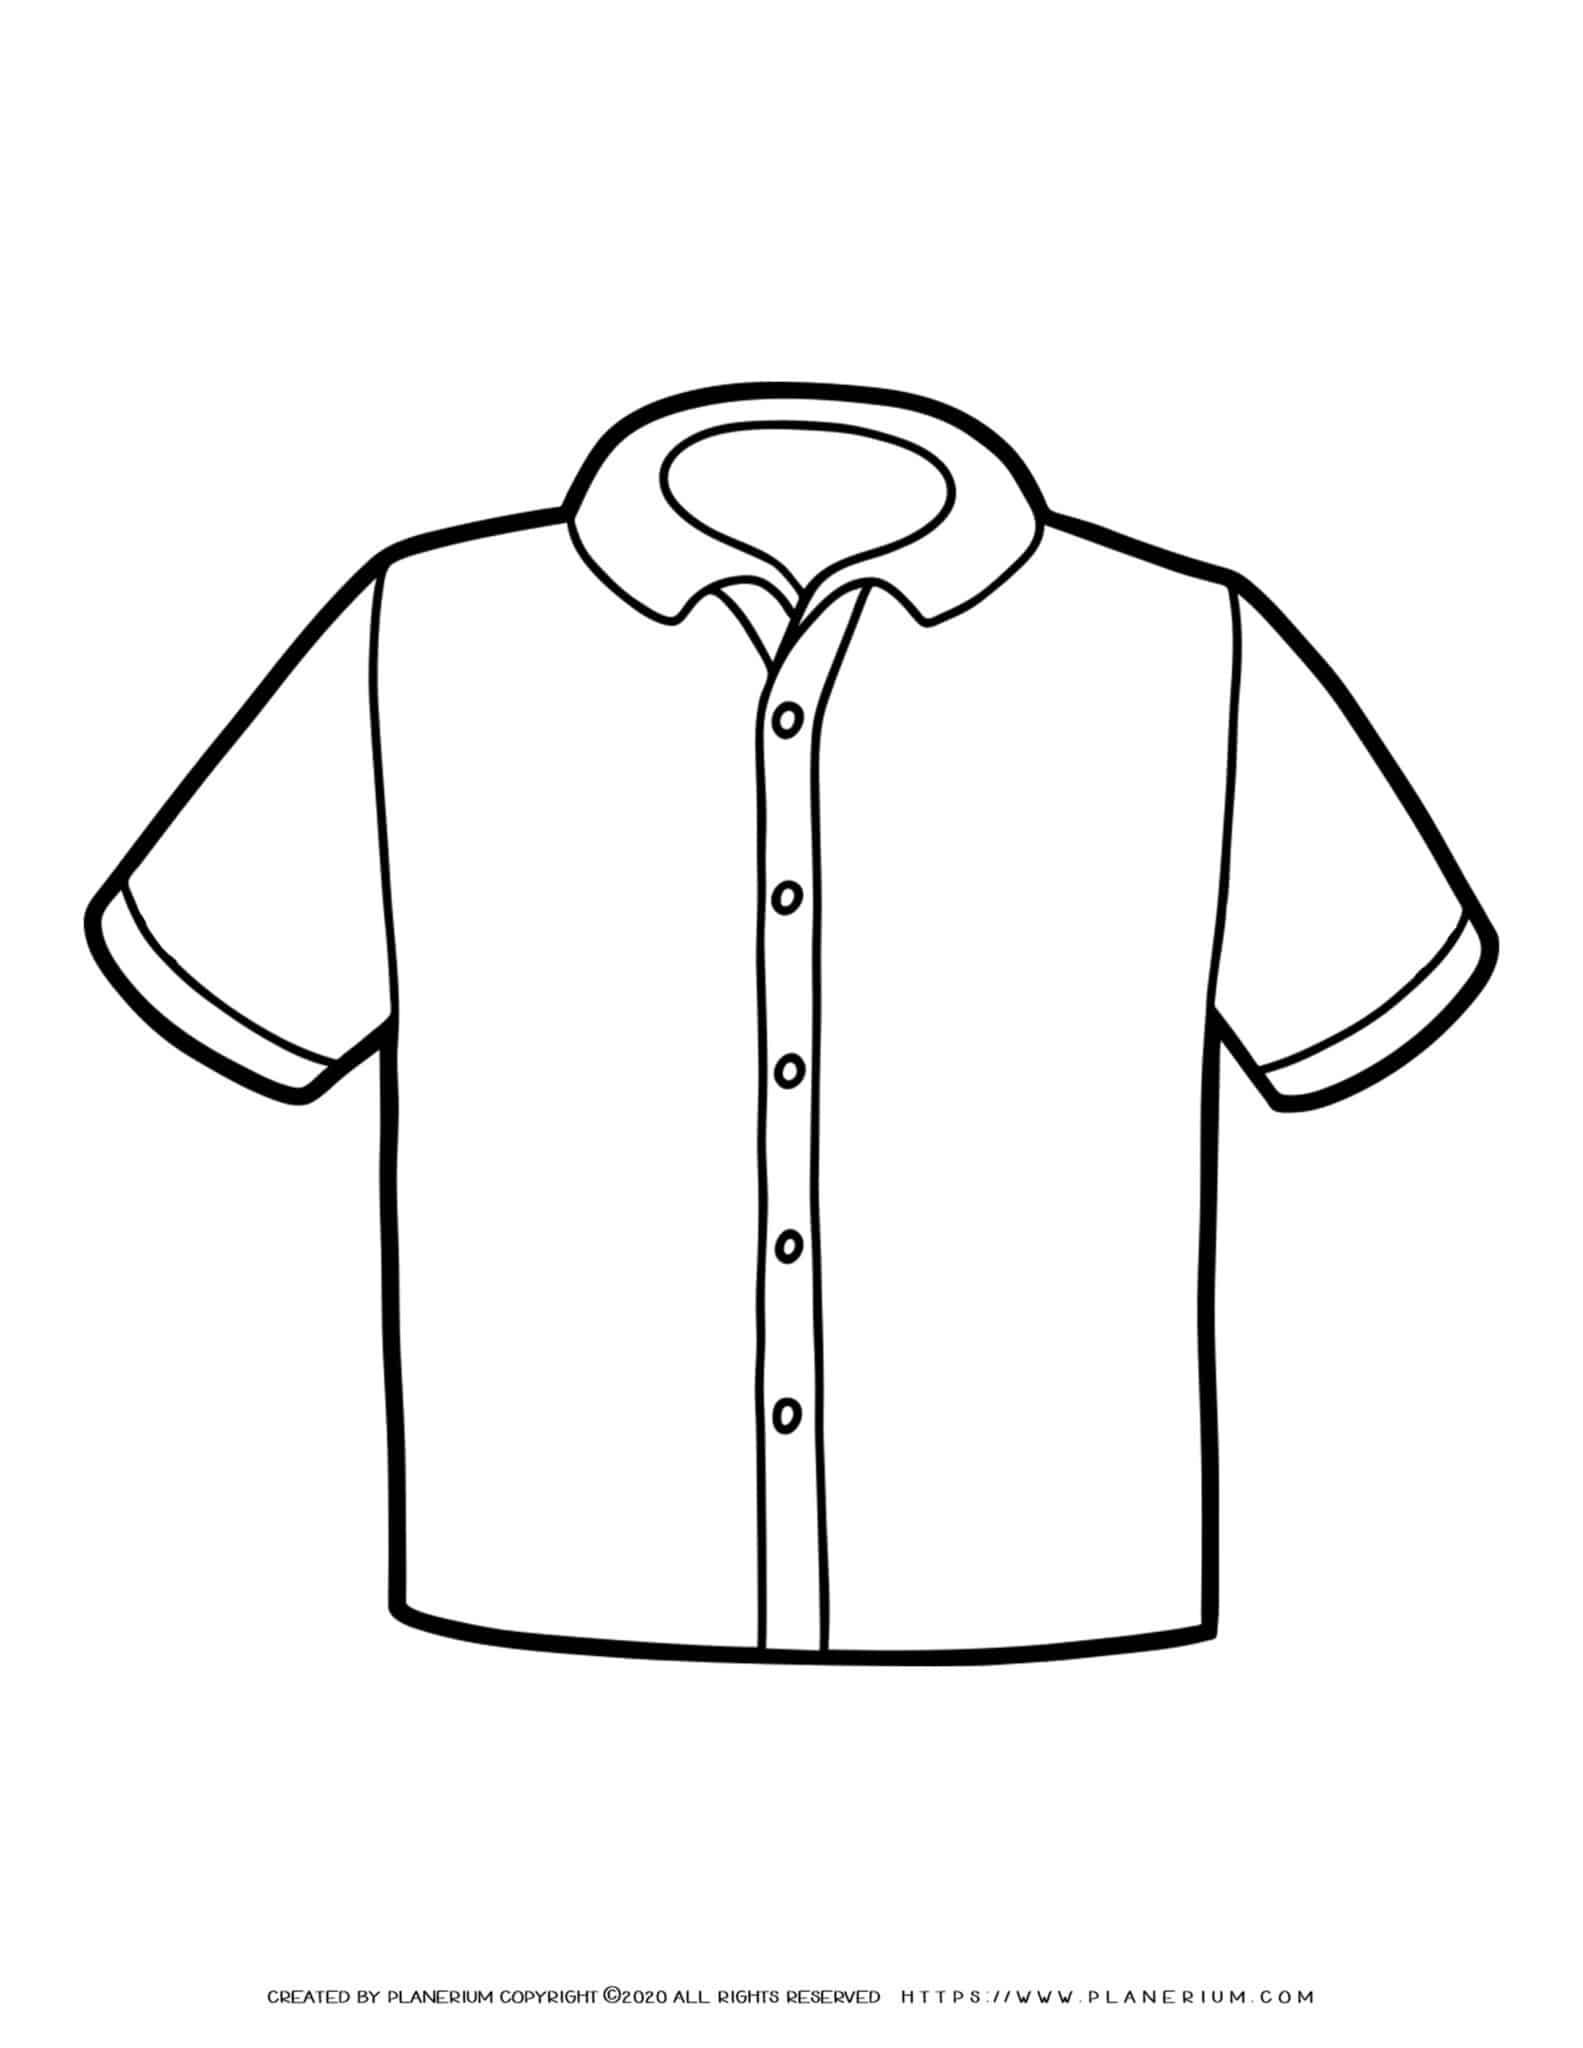 Clothes Template - Man Short Sleeve Shirt   Planerium